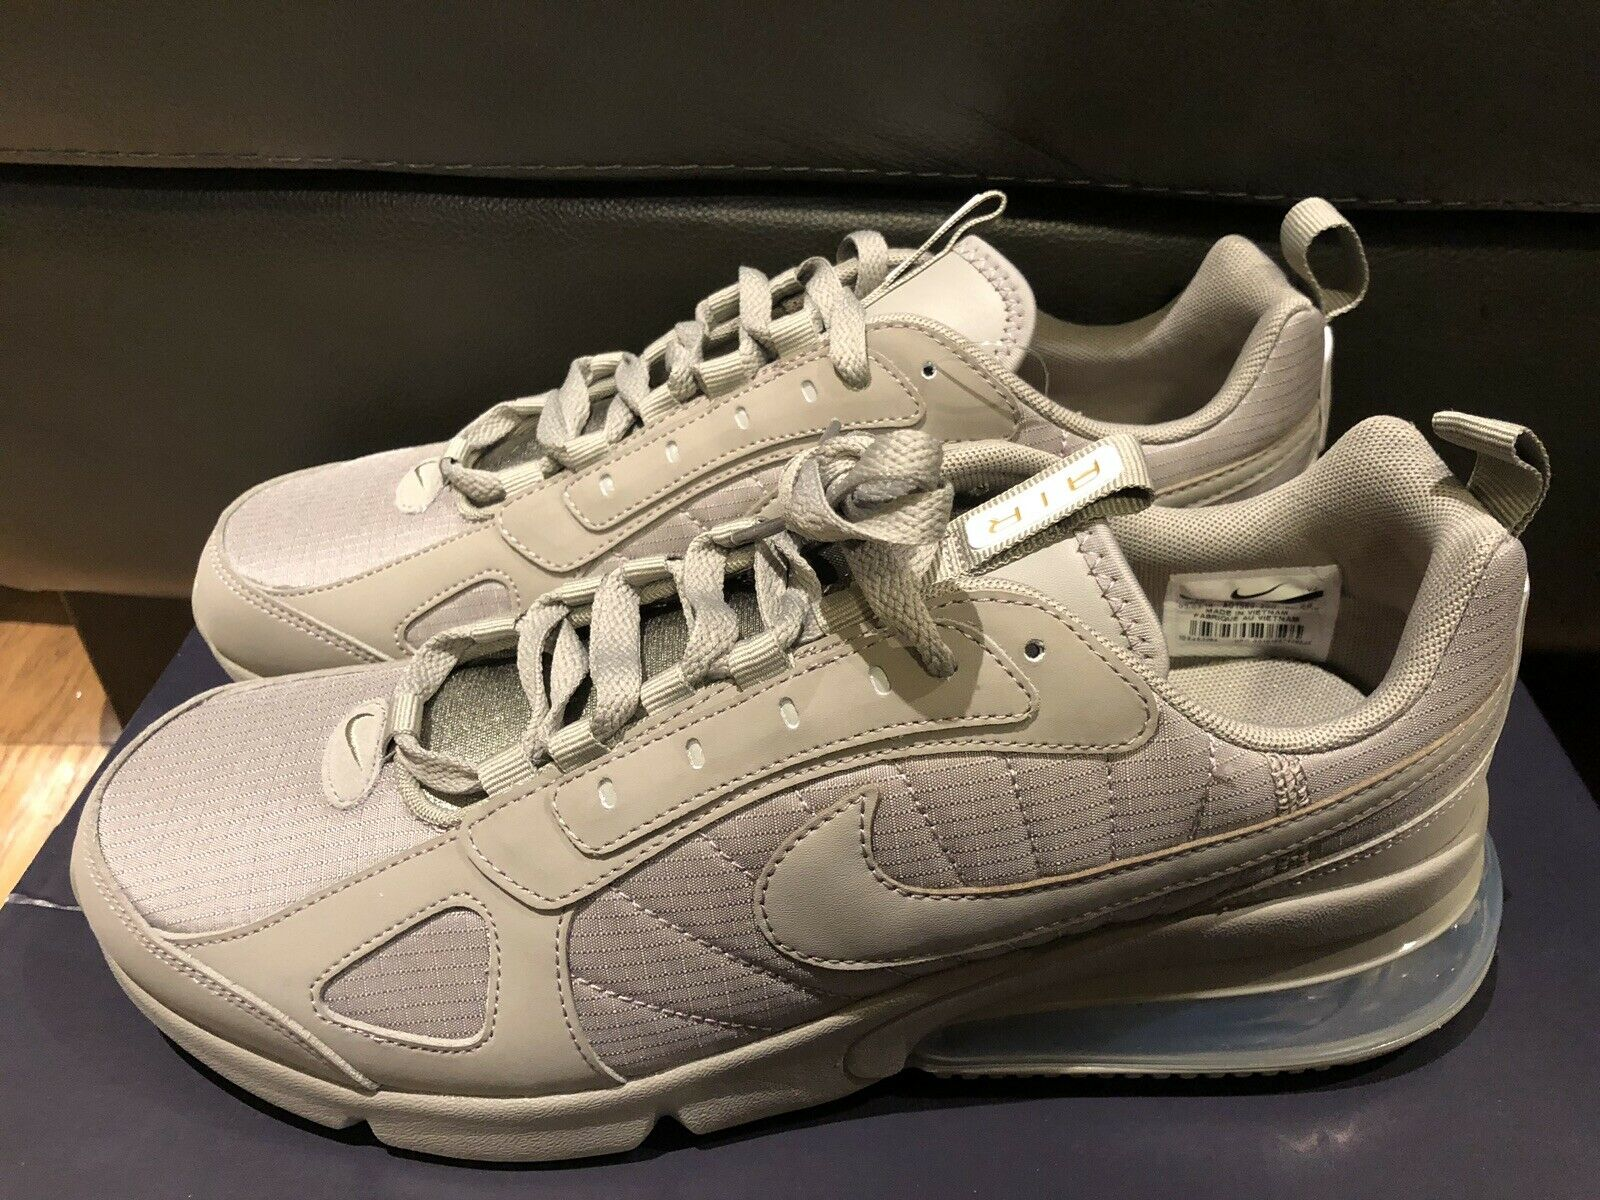 Nike Mens Air Max 270 Future Running shoes Sneaker Sz Sz Sz 10 New AO1569-001 Beige 83690b